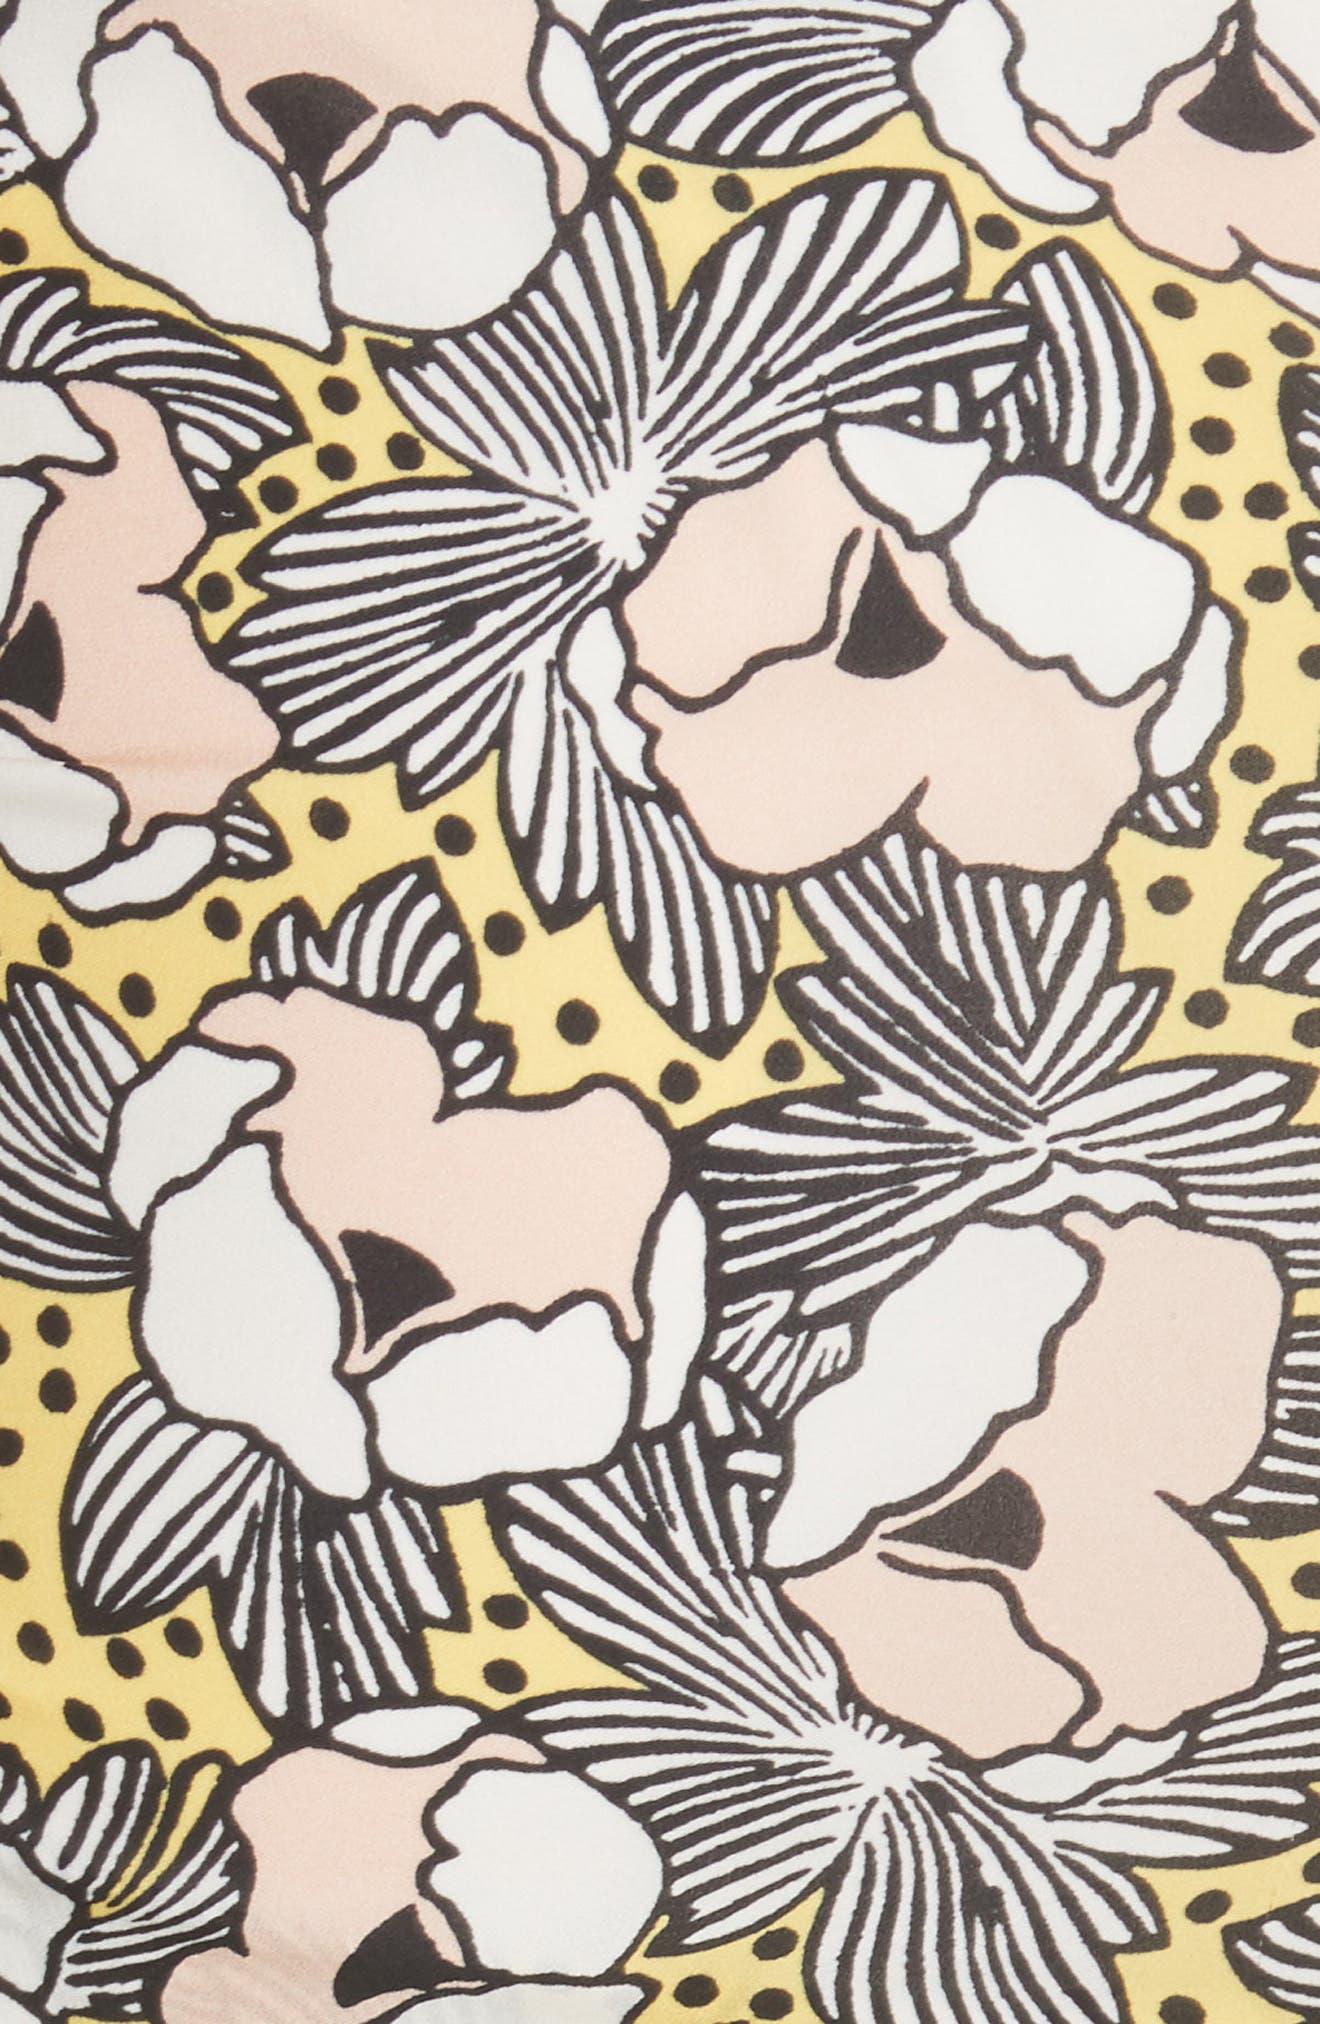 Martine Floral Print Dress,                             Alternate thumbnail 7, color,